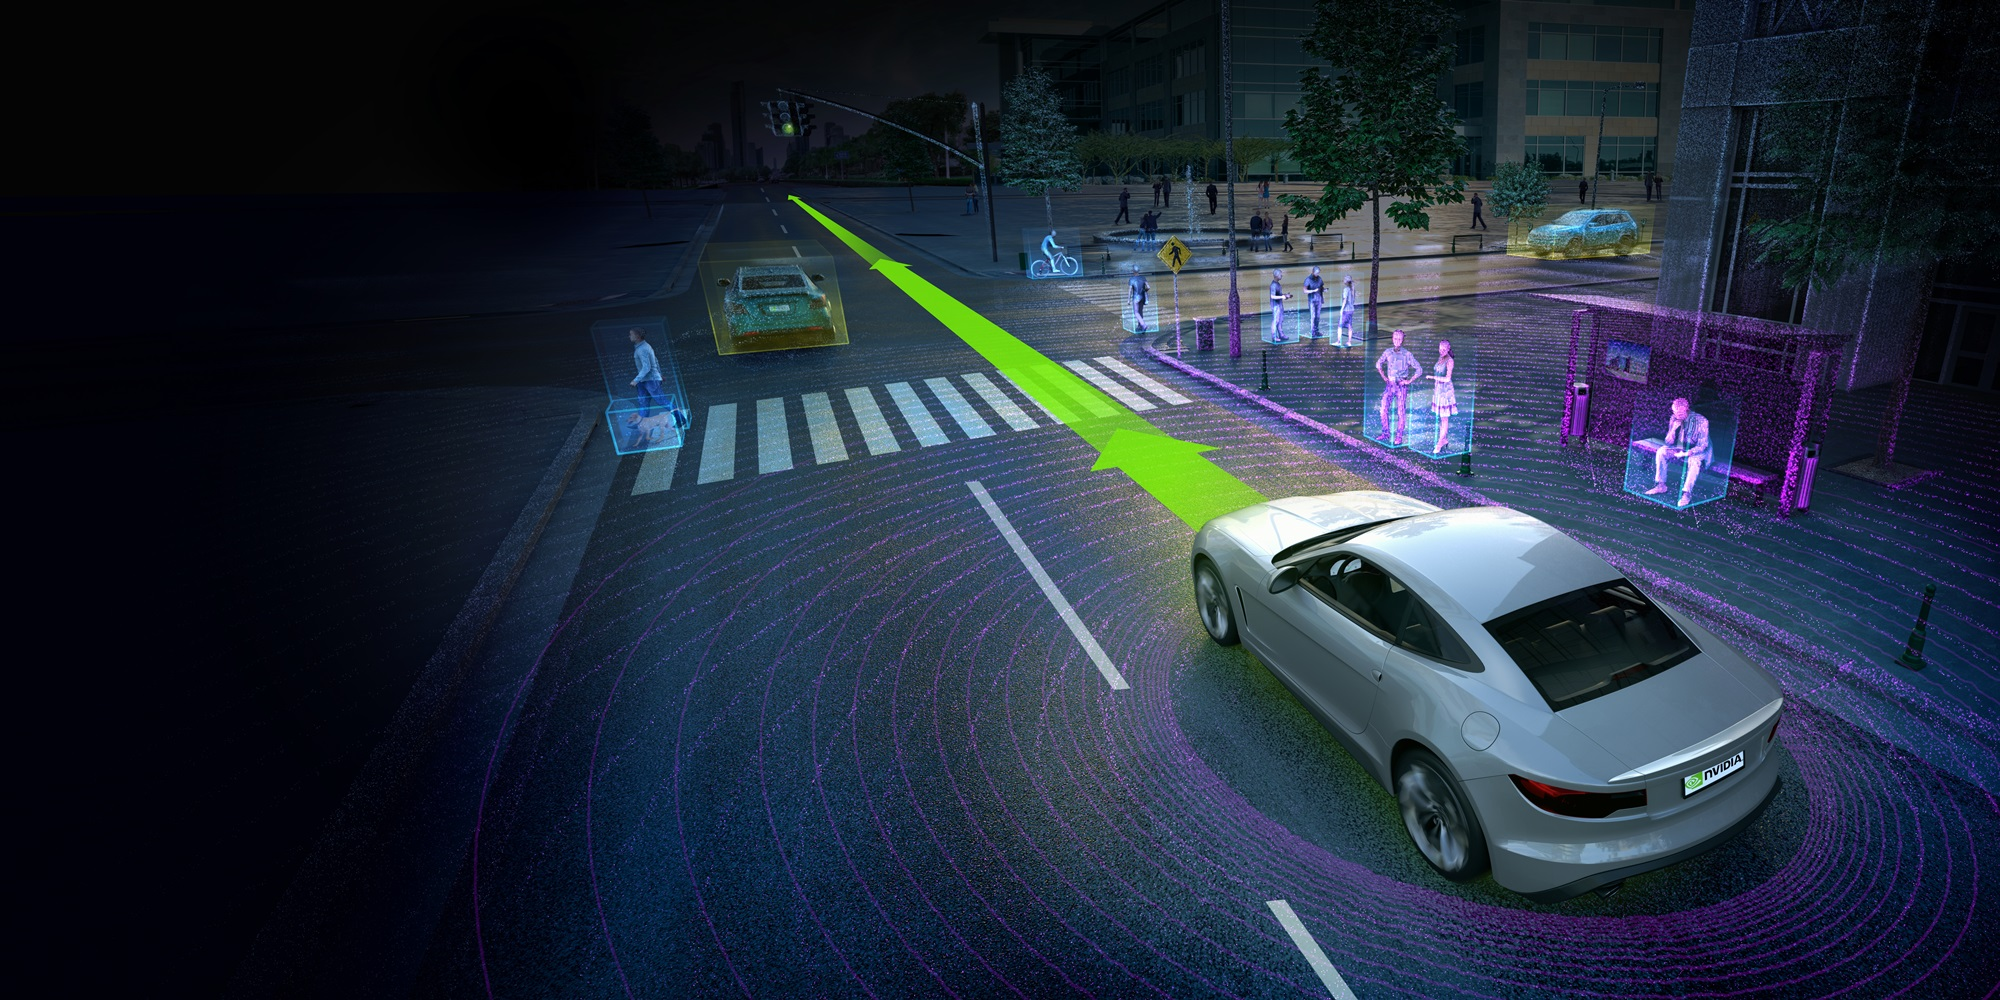 DriveNet identifica objetos alrededor del auto